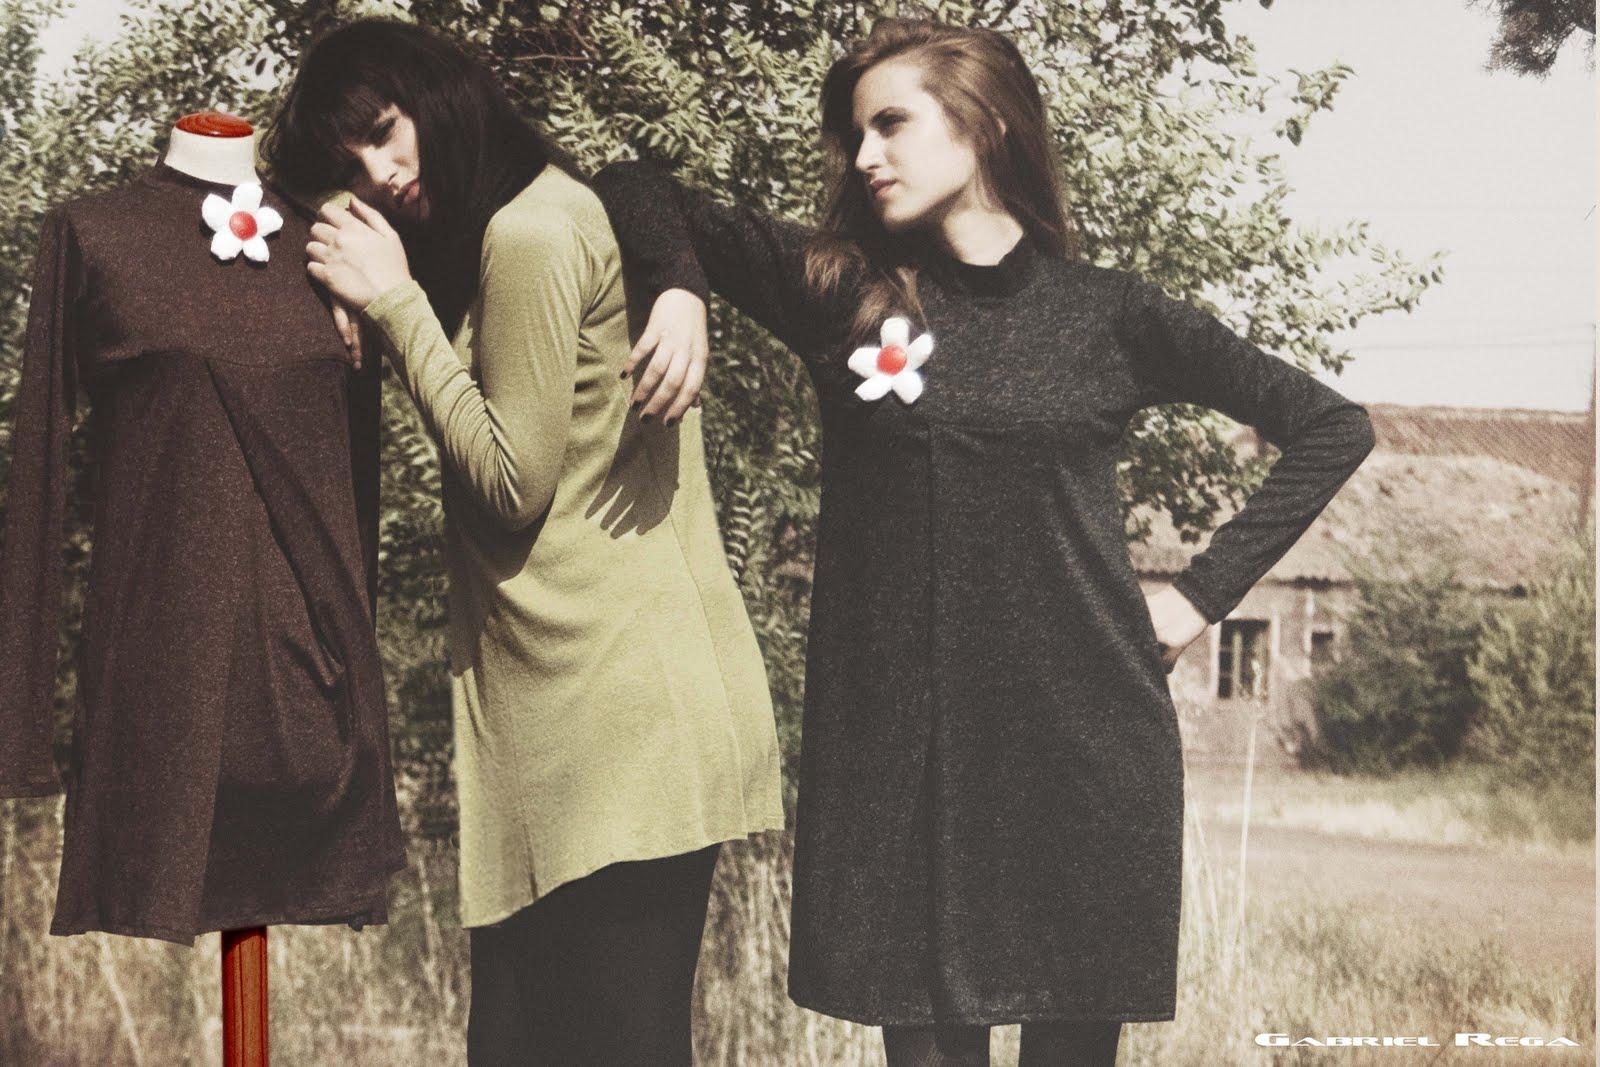 dresses by Senorita Martita